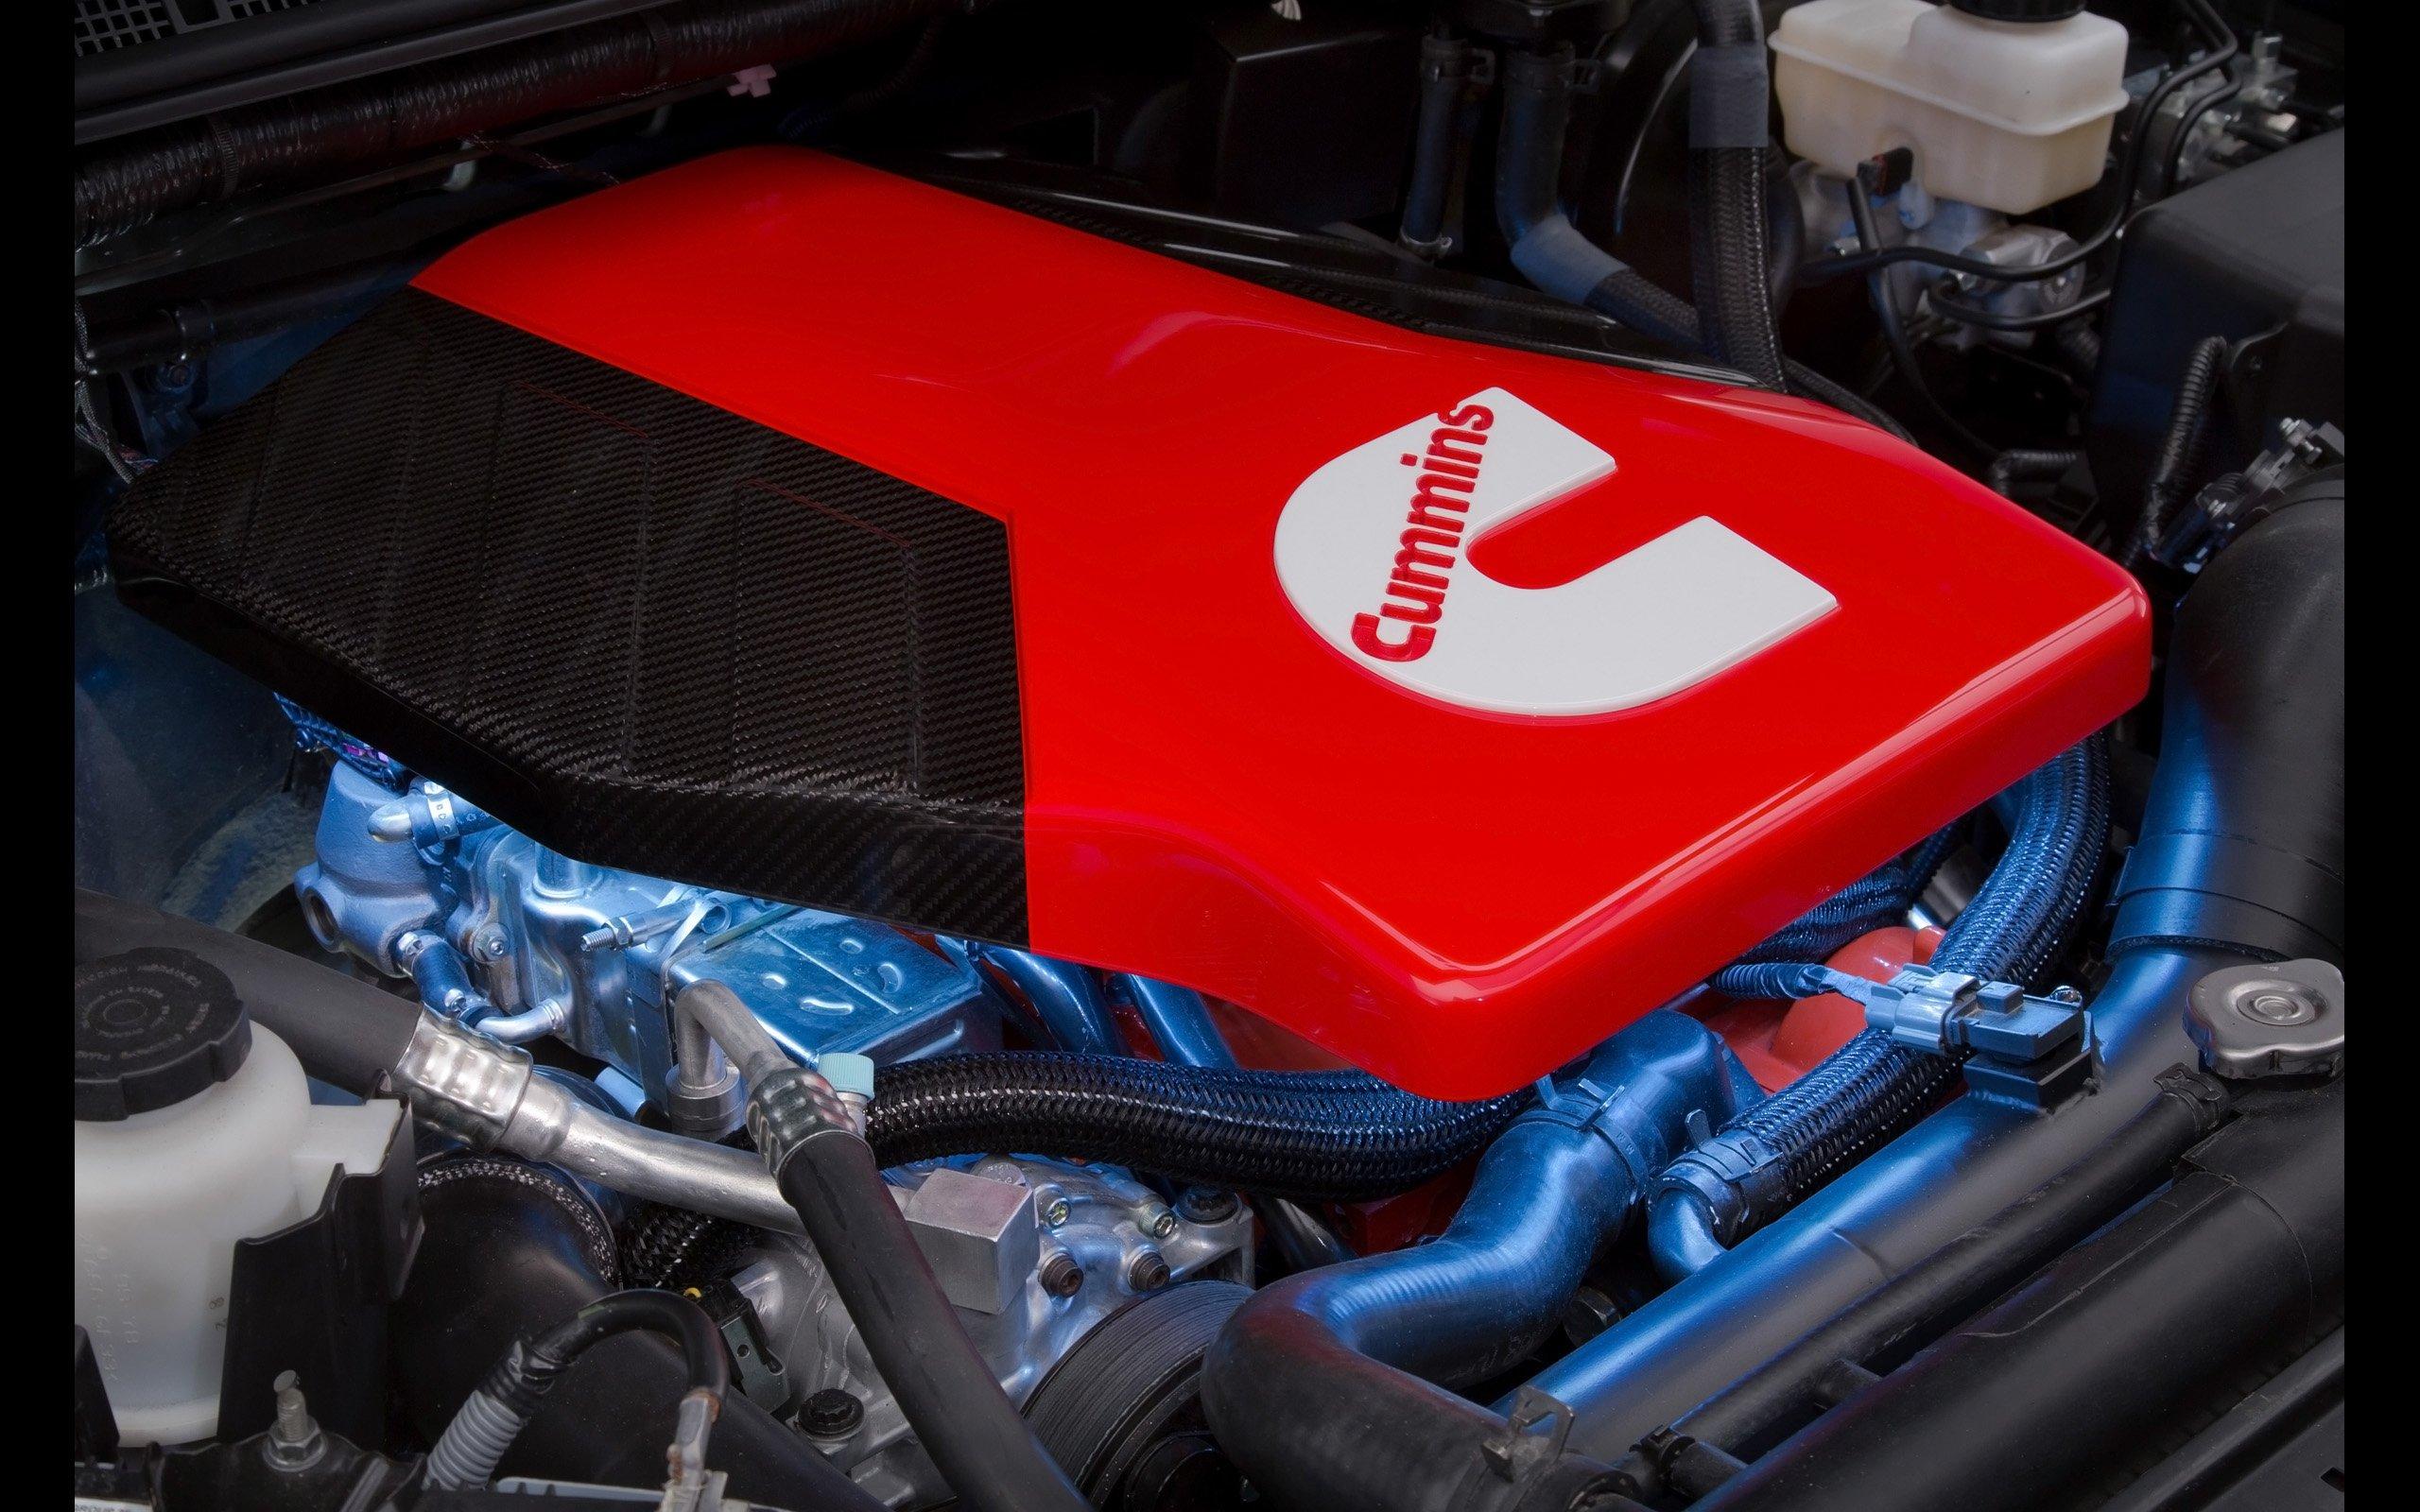 Gbwa on 6 5 Turbo Diesel Upgrade